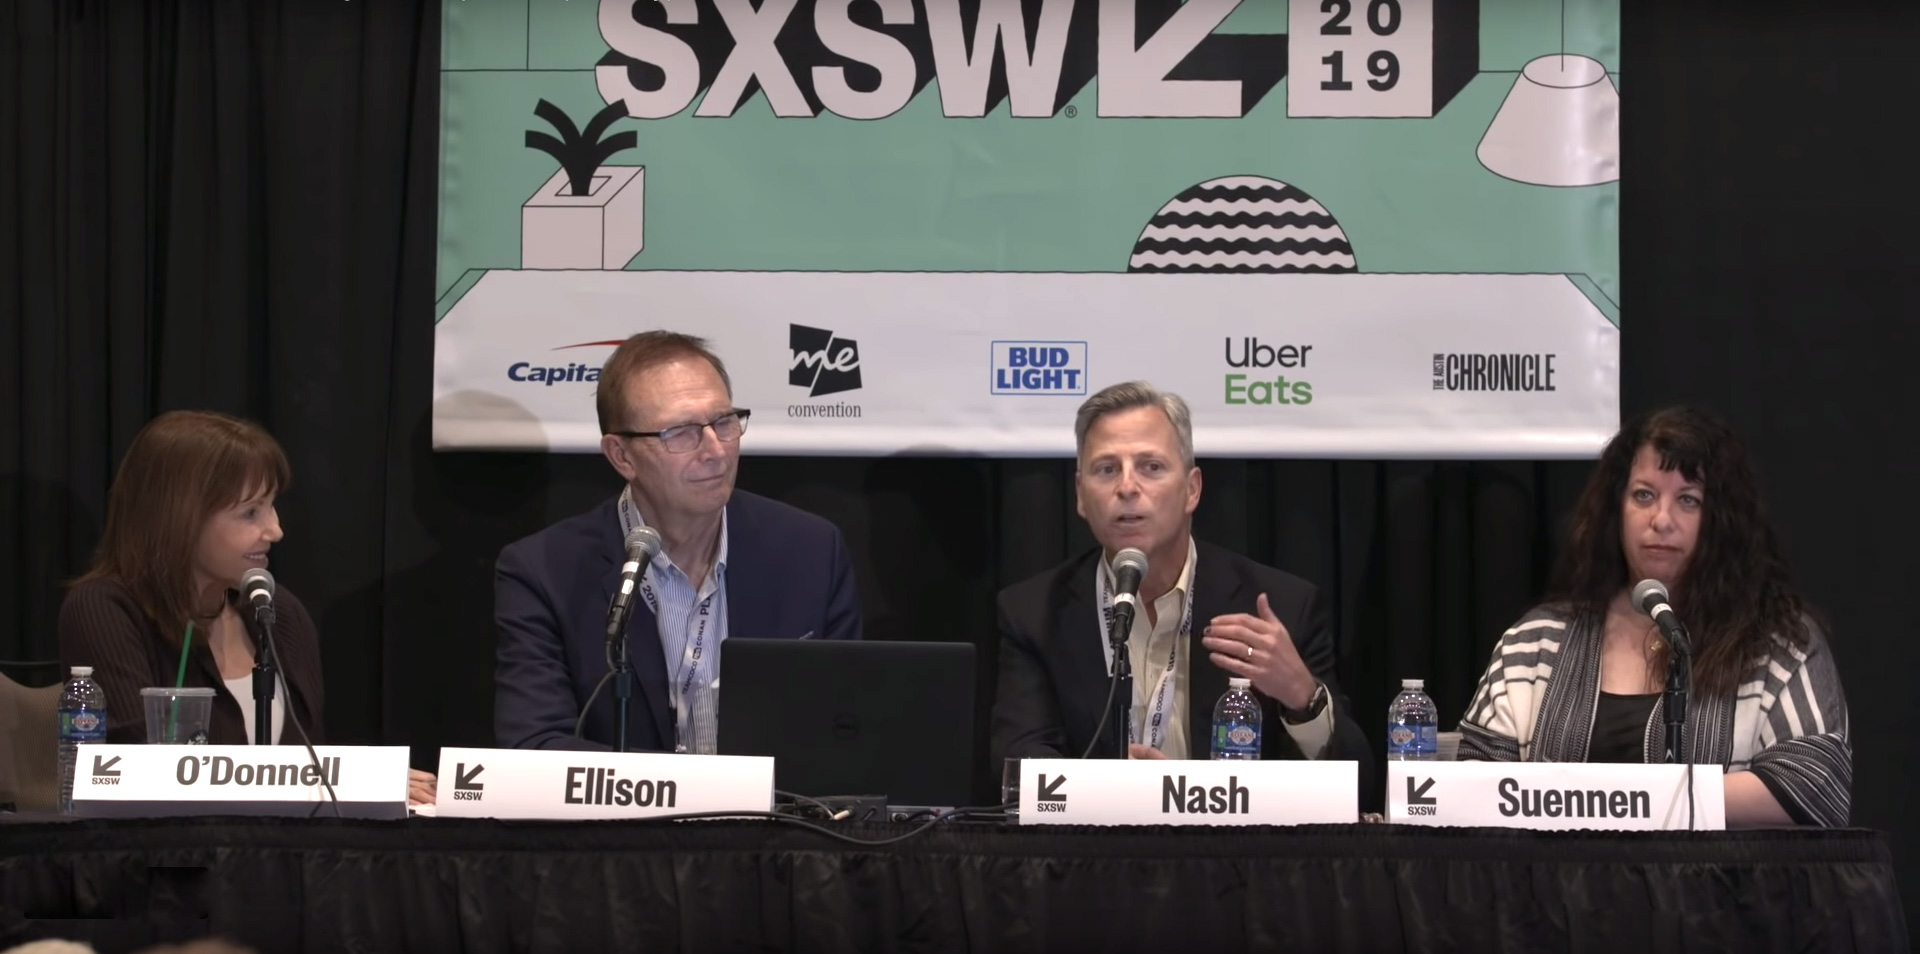 Dr. Nash at SxSW panel